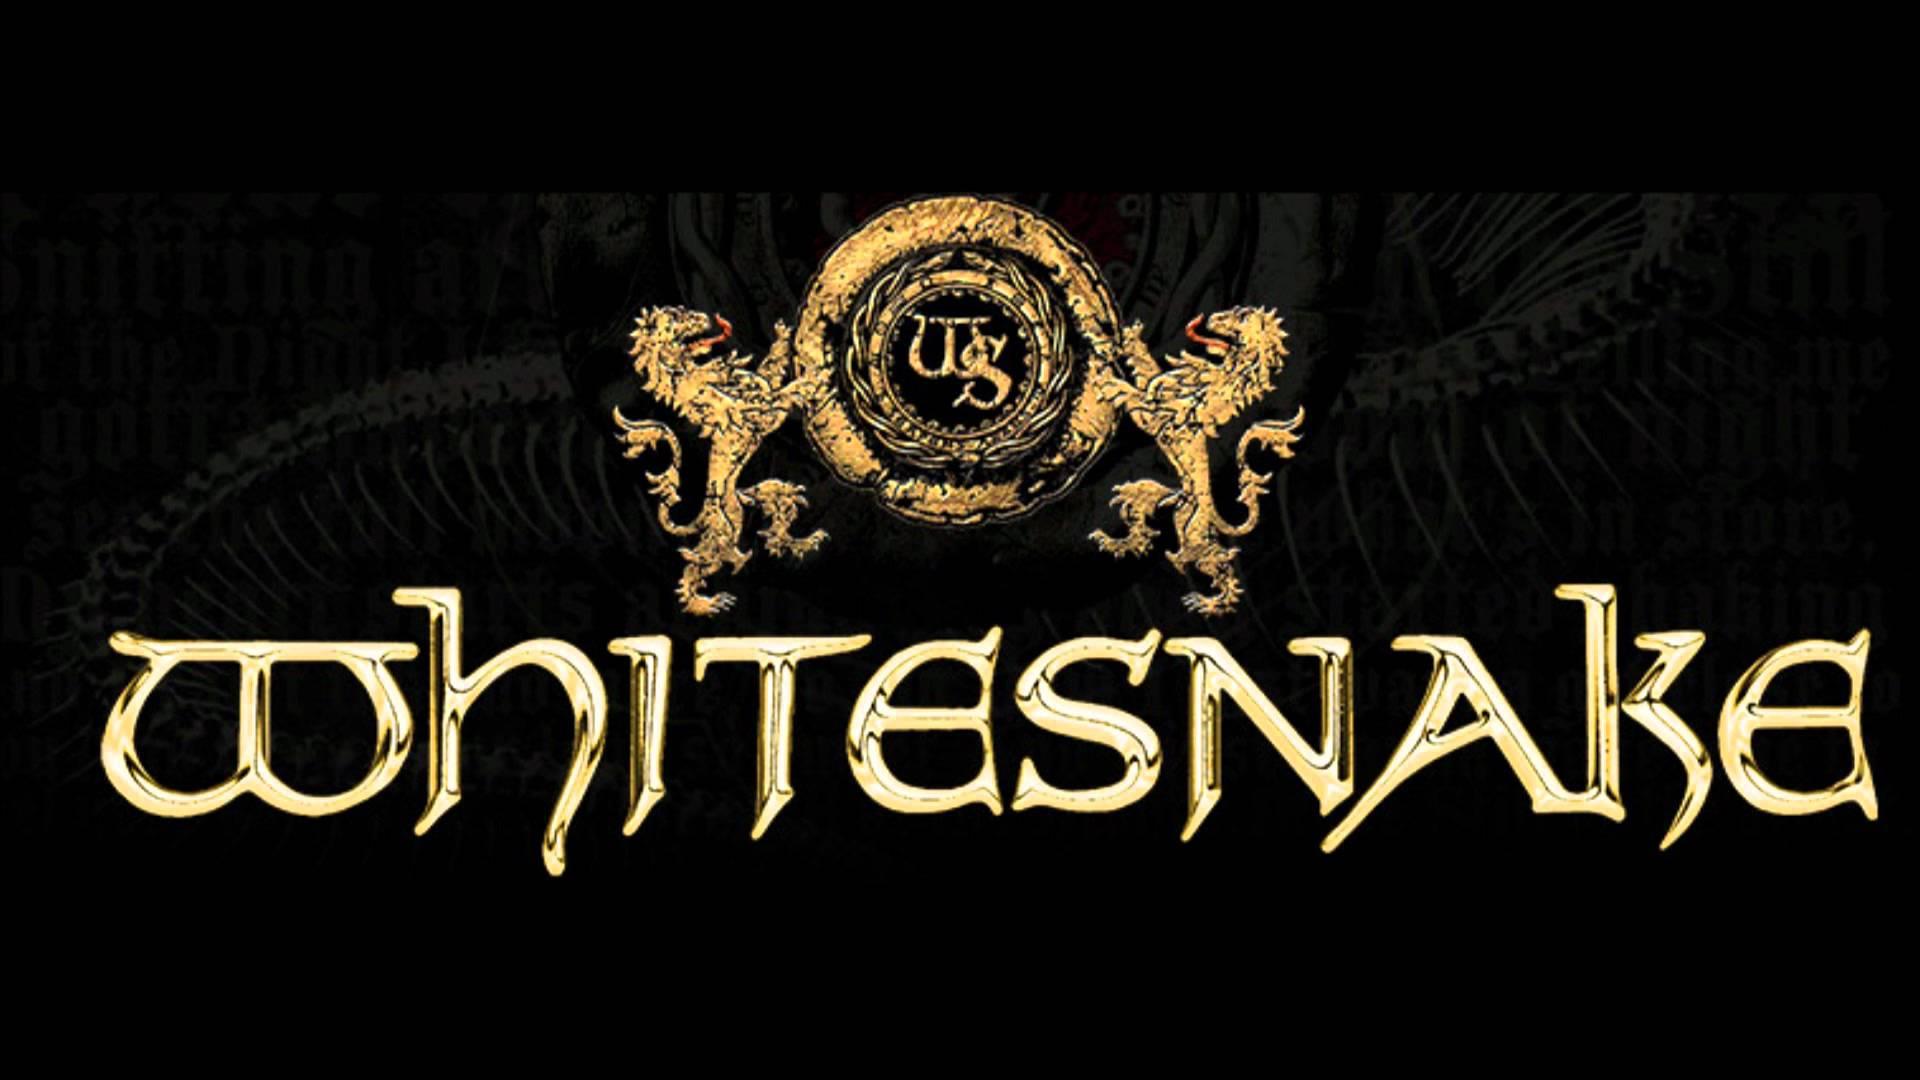 Whitesnake Slow an Easy 1920x1080